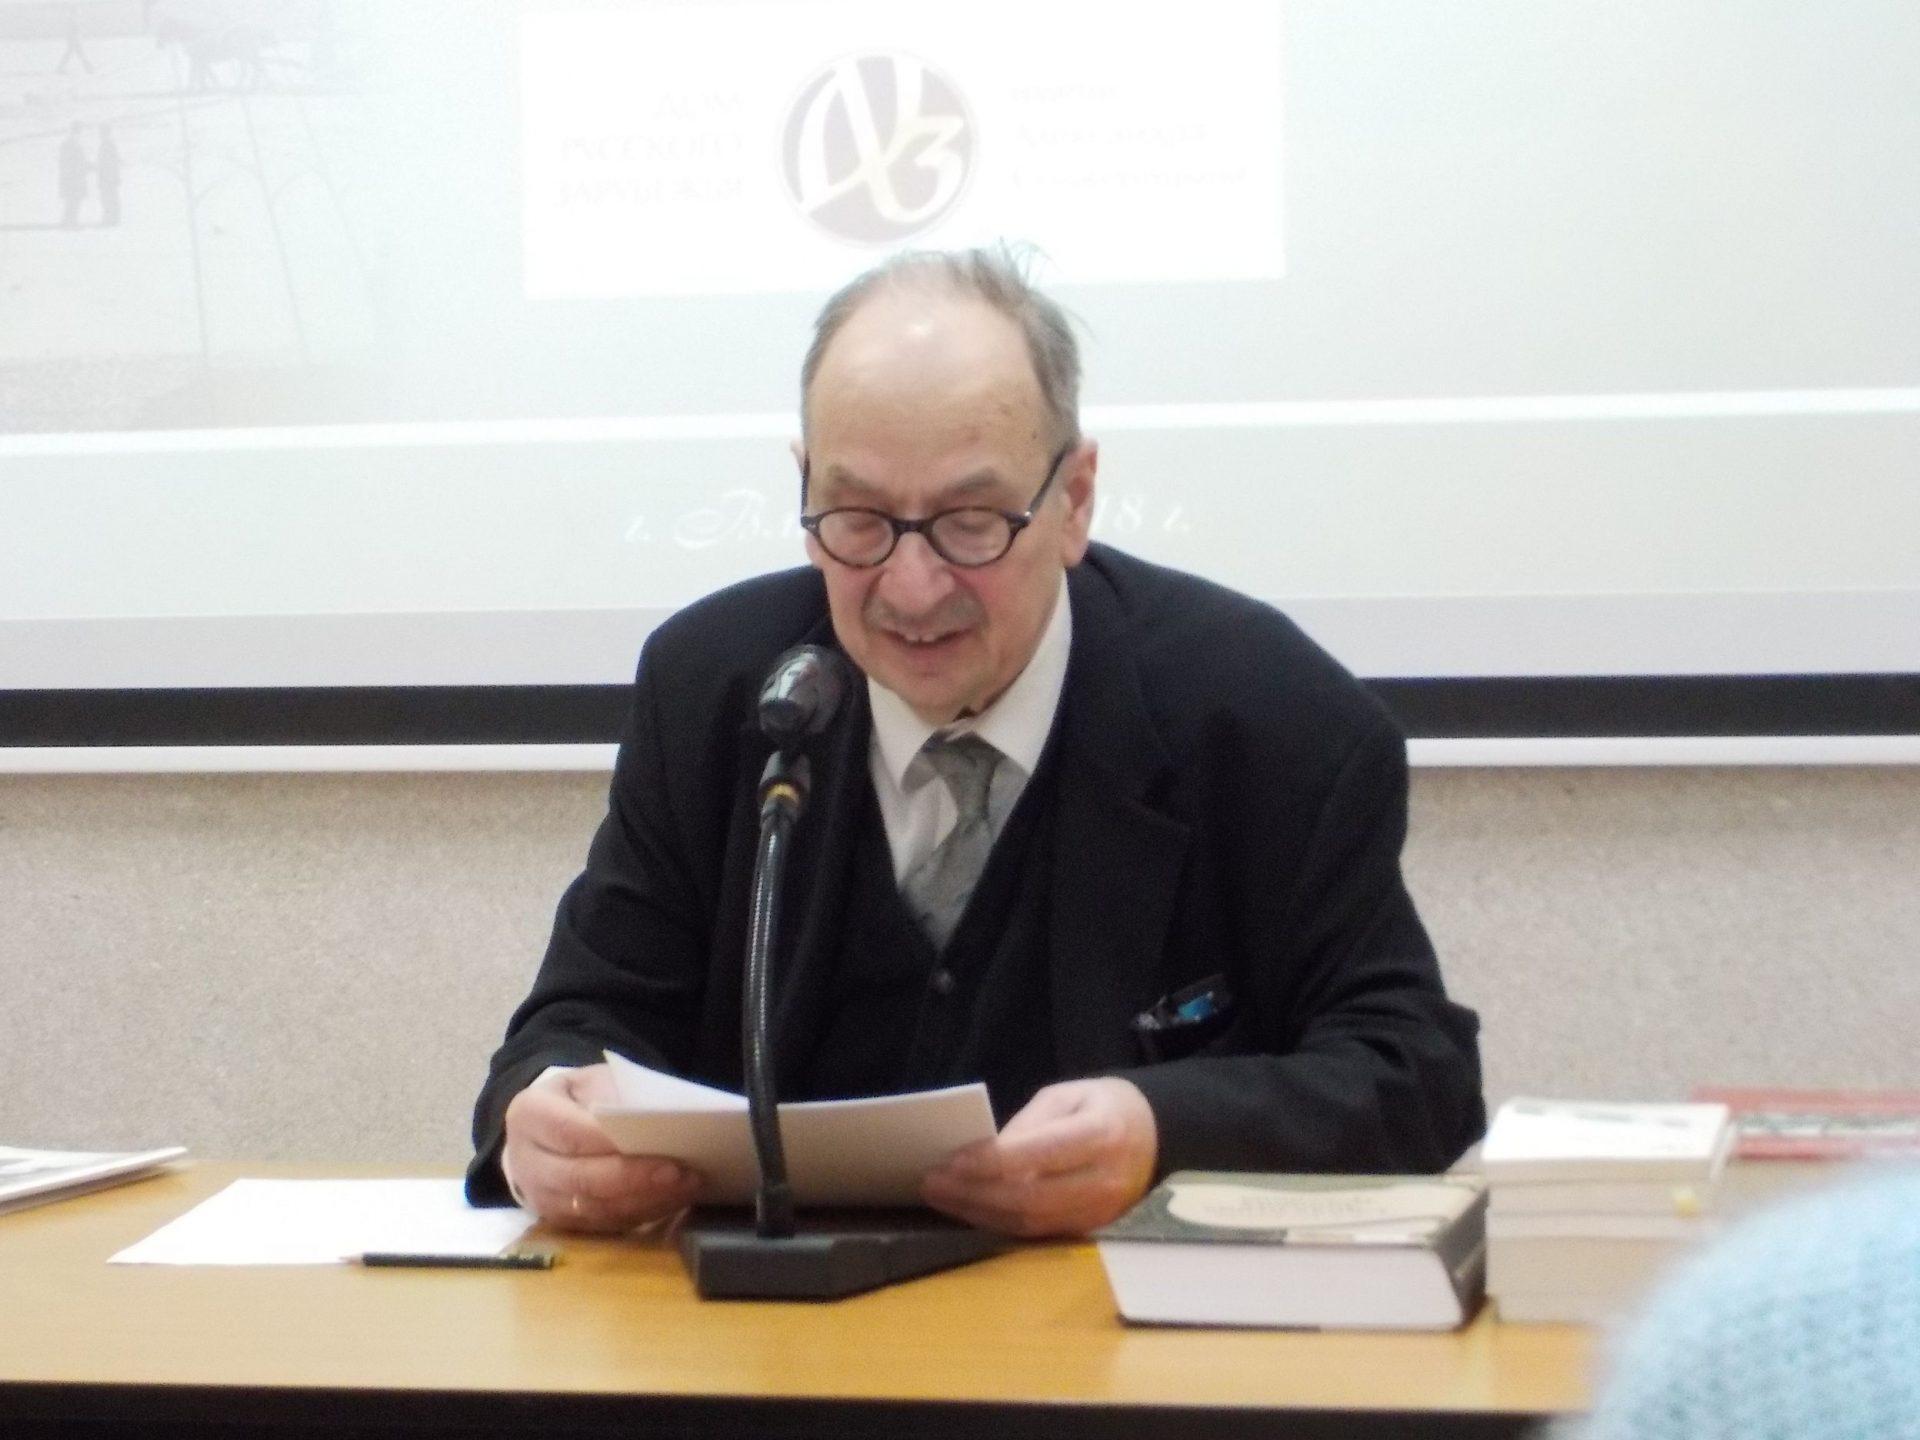 Professor Gottfrid Kratz